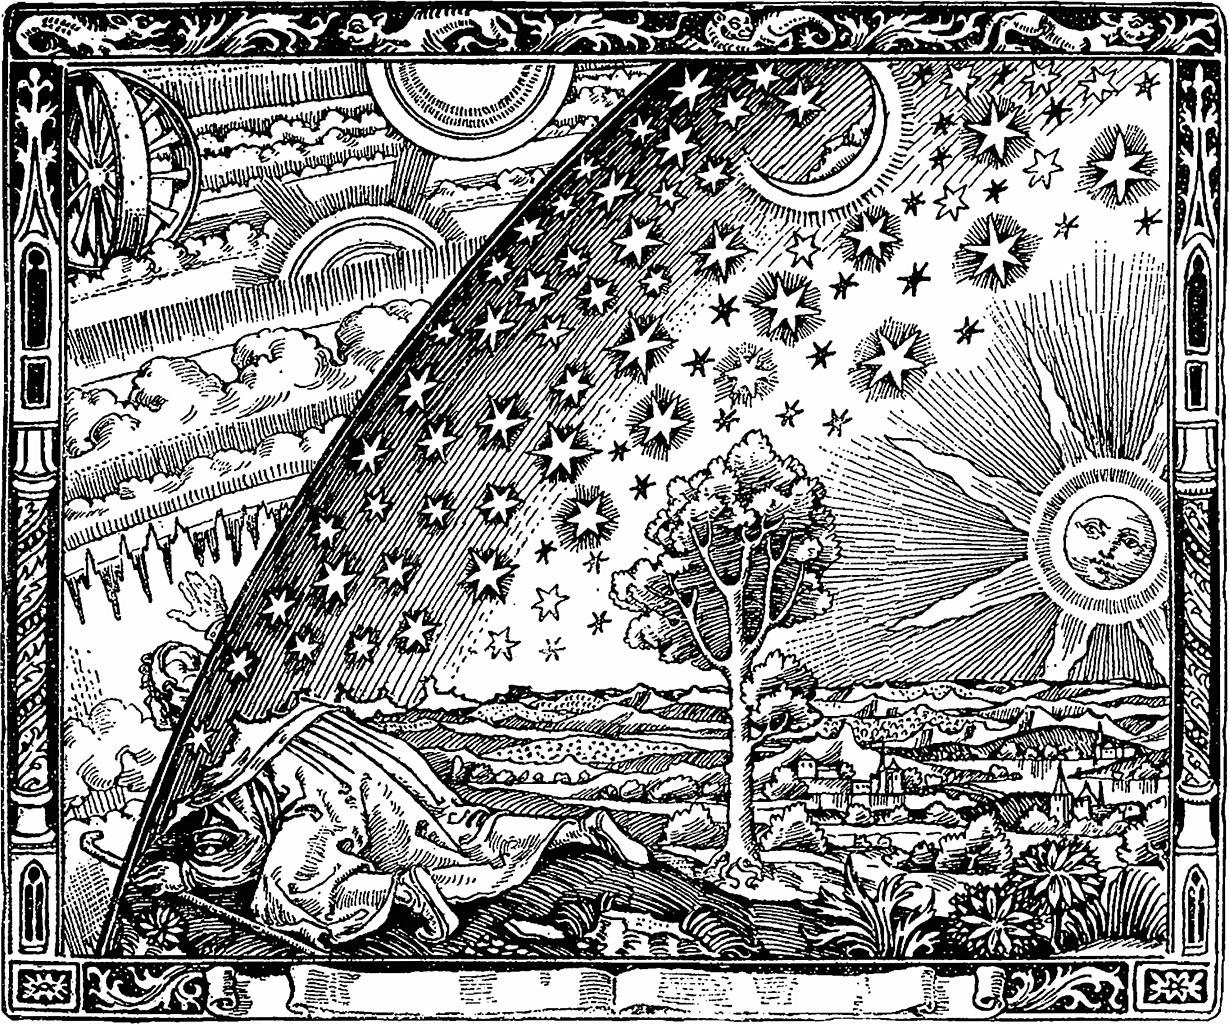 Flache Erde Mythos